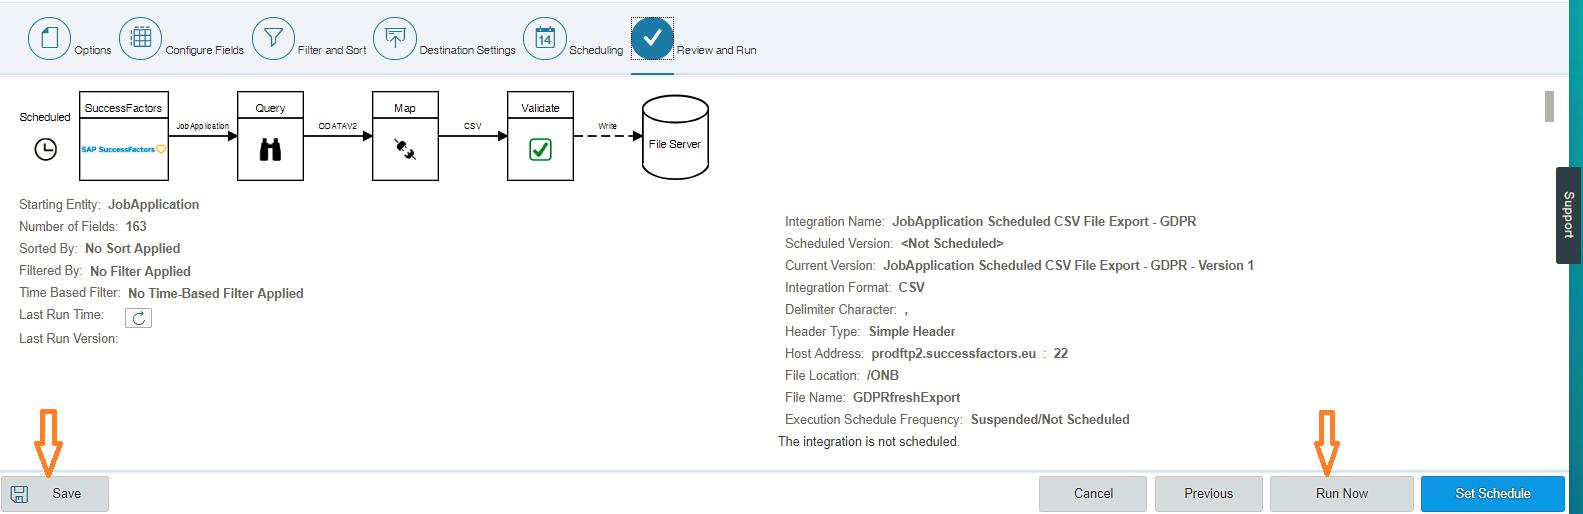 Updating Applicant Status Using Integration Center   SAP Blogs